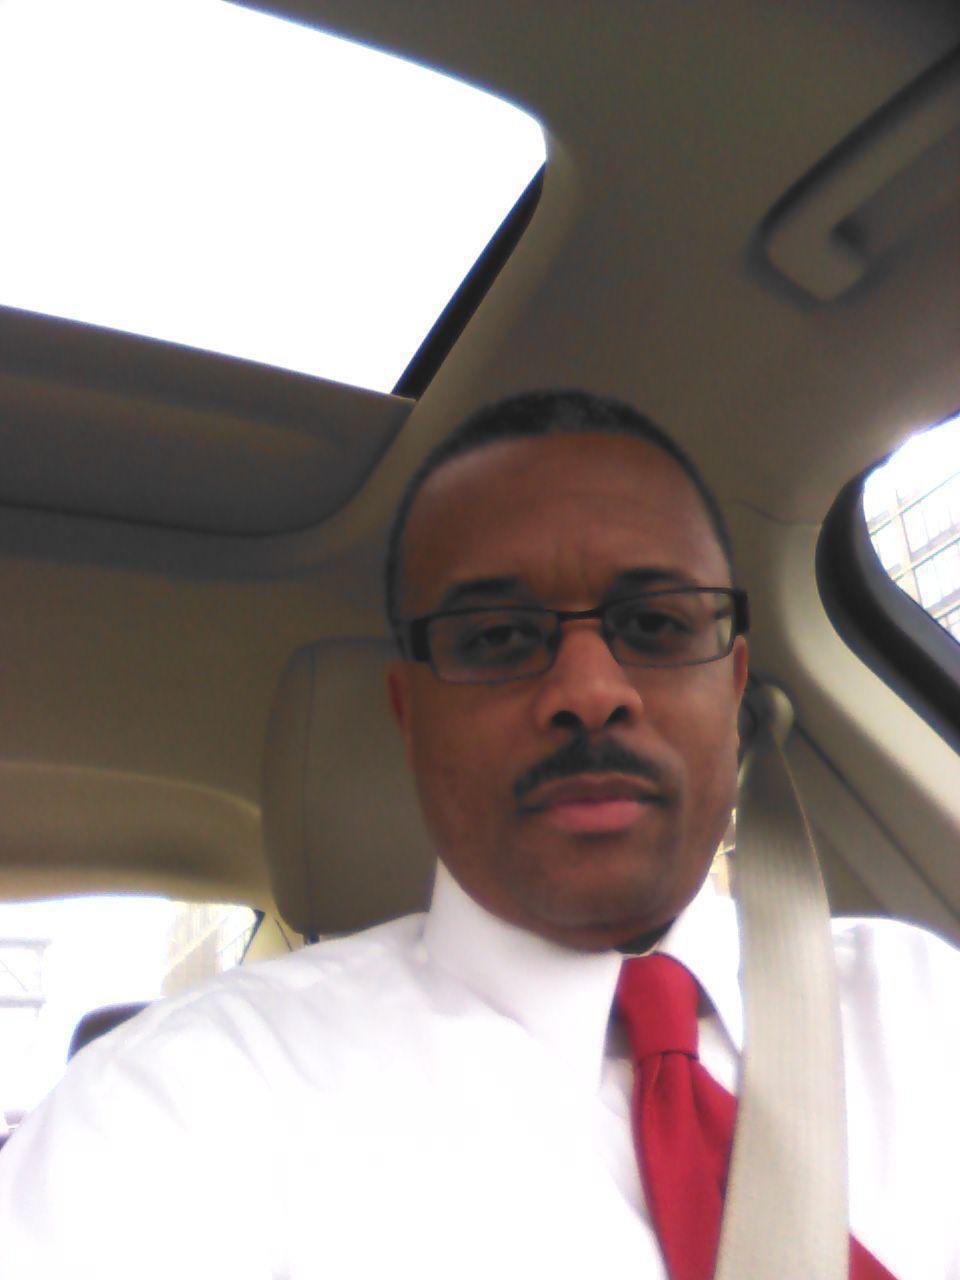 black single men in beltsville Greenbelt, md - just where do you find those single guys.